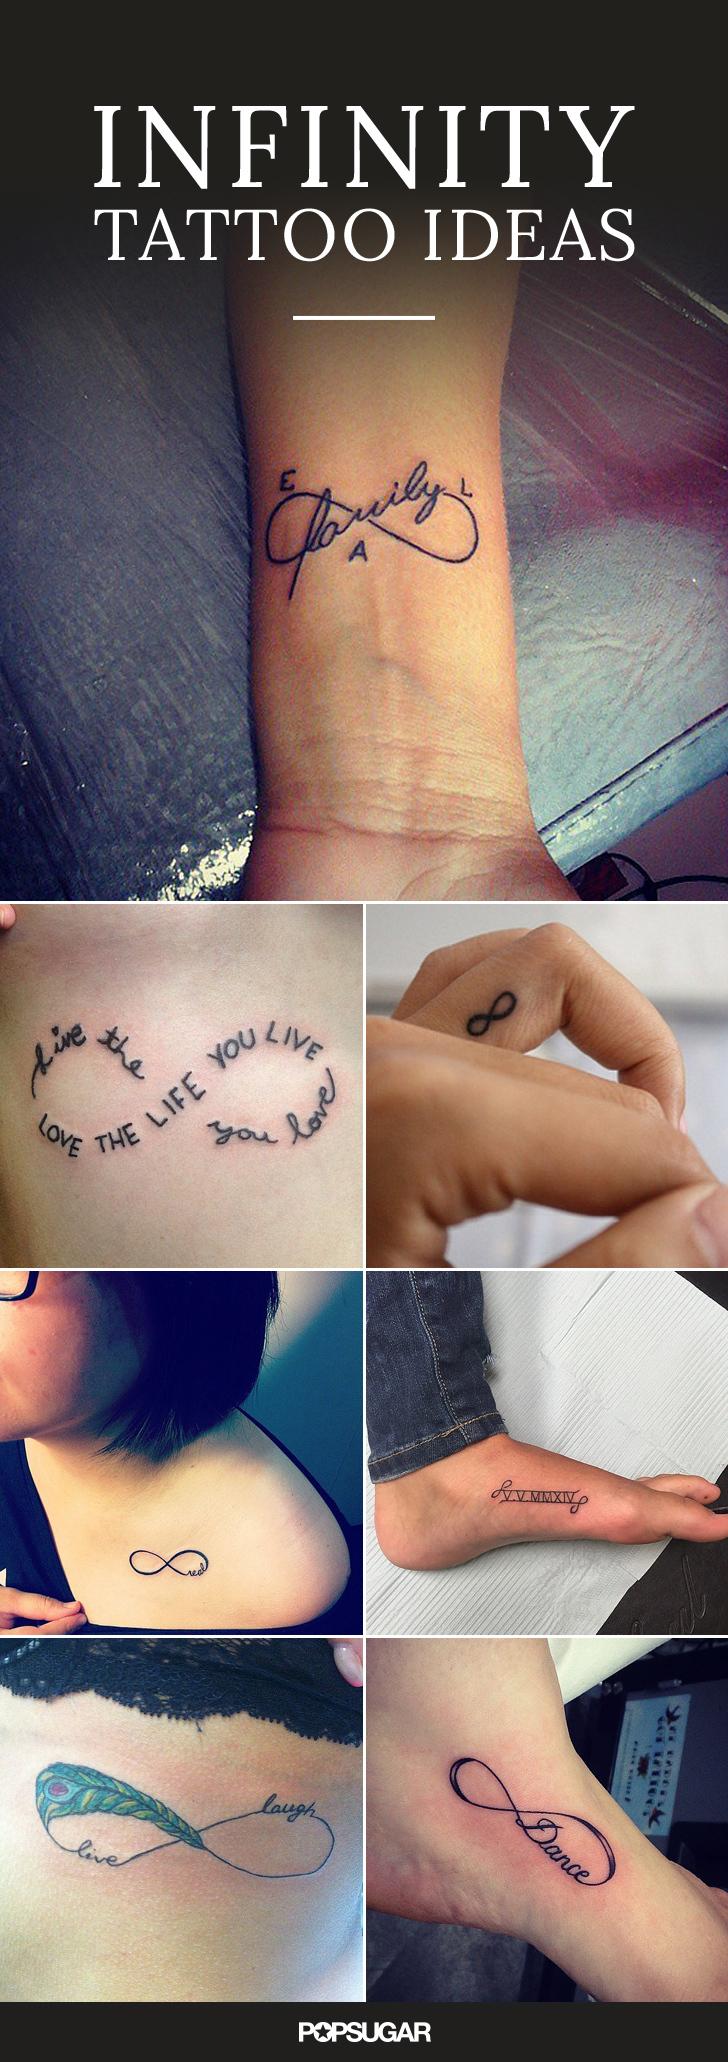 21 infinity sign tattoos you won t regret getting original